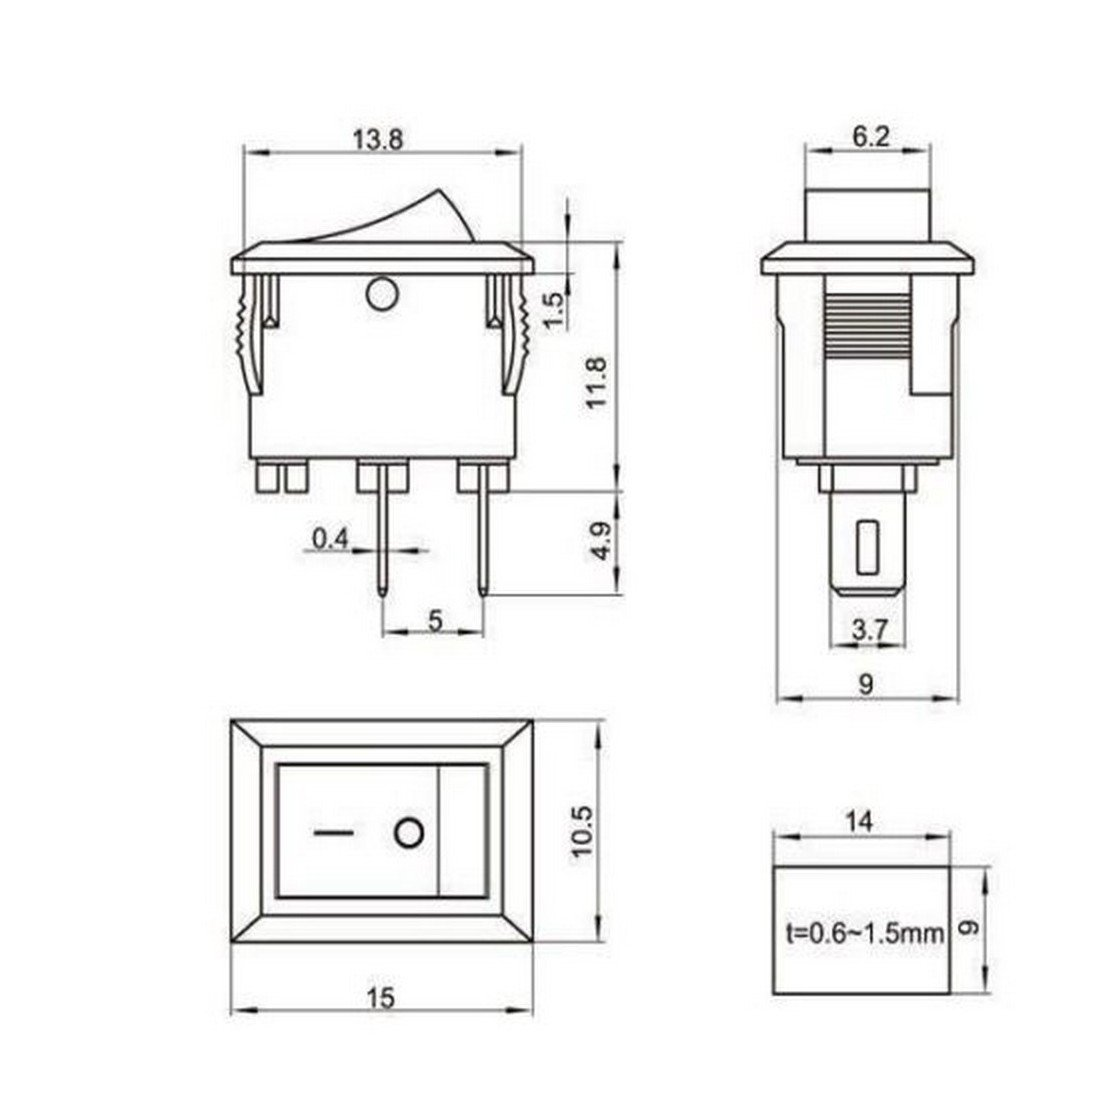 2 x Mini Wippschalter SPST – Kcd1 – 11 3 A 250 V 10 x 15 On/Off – 27 ...